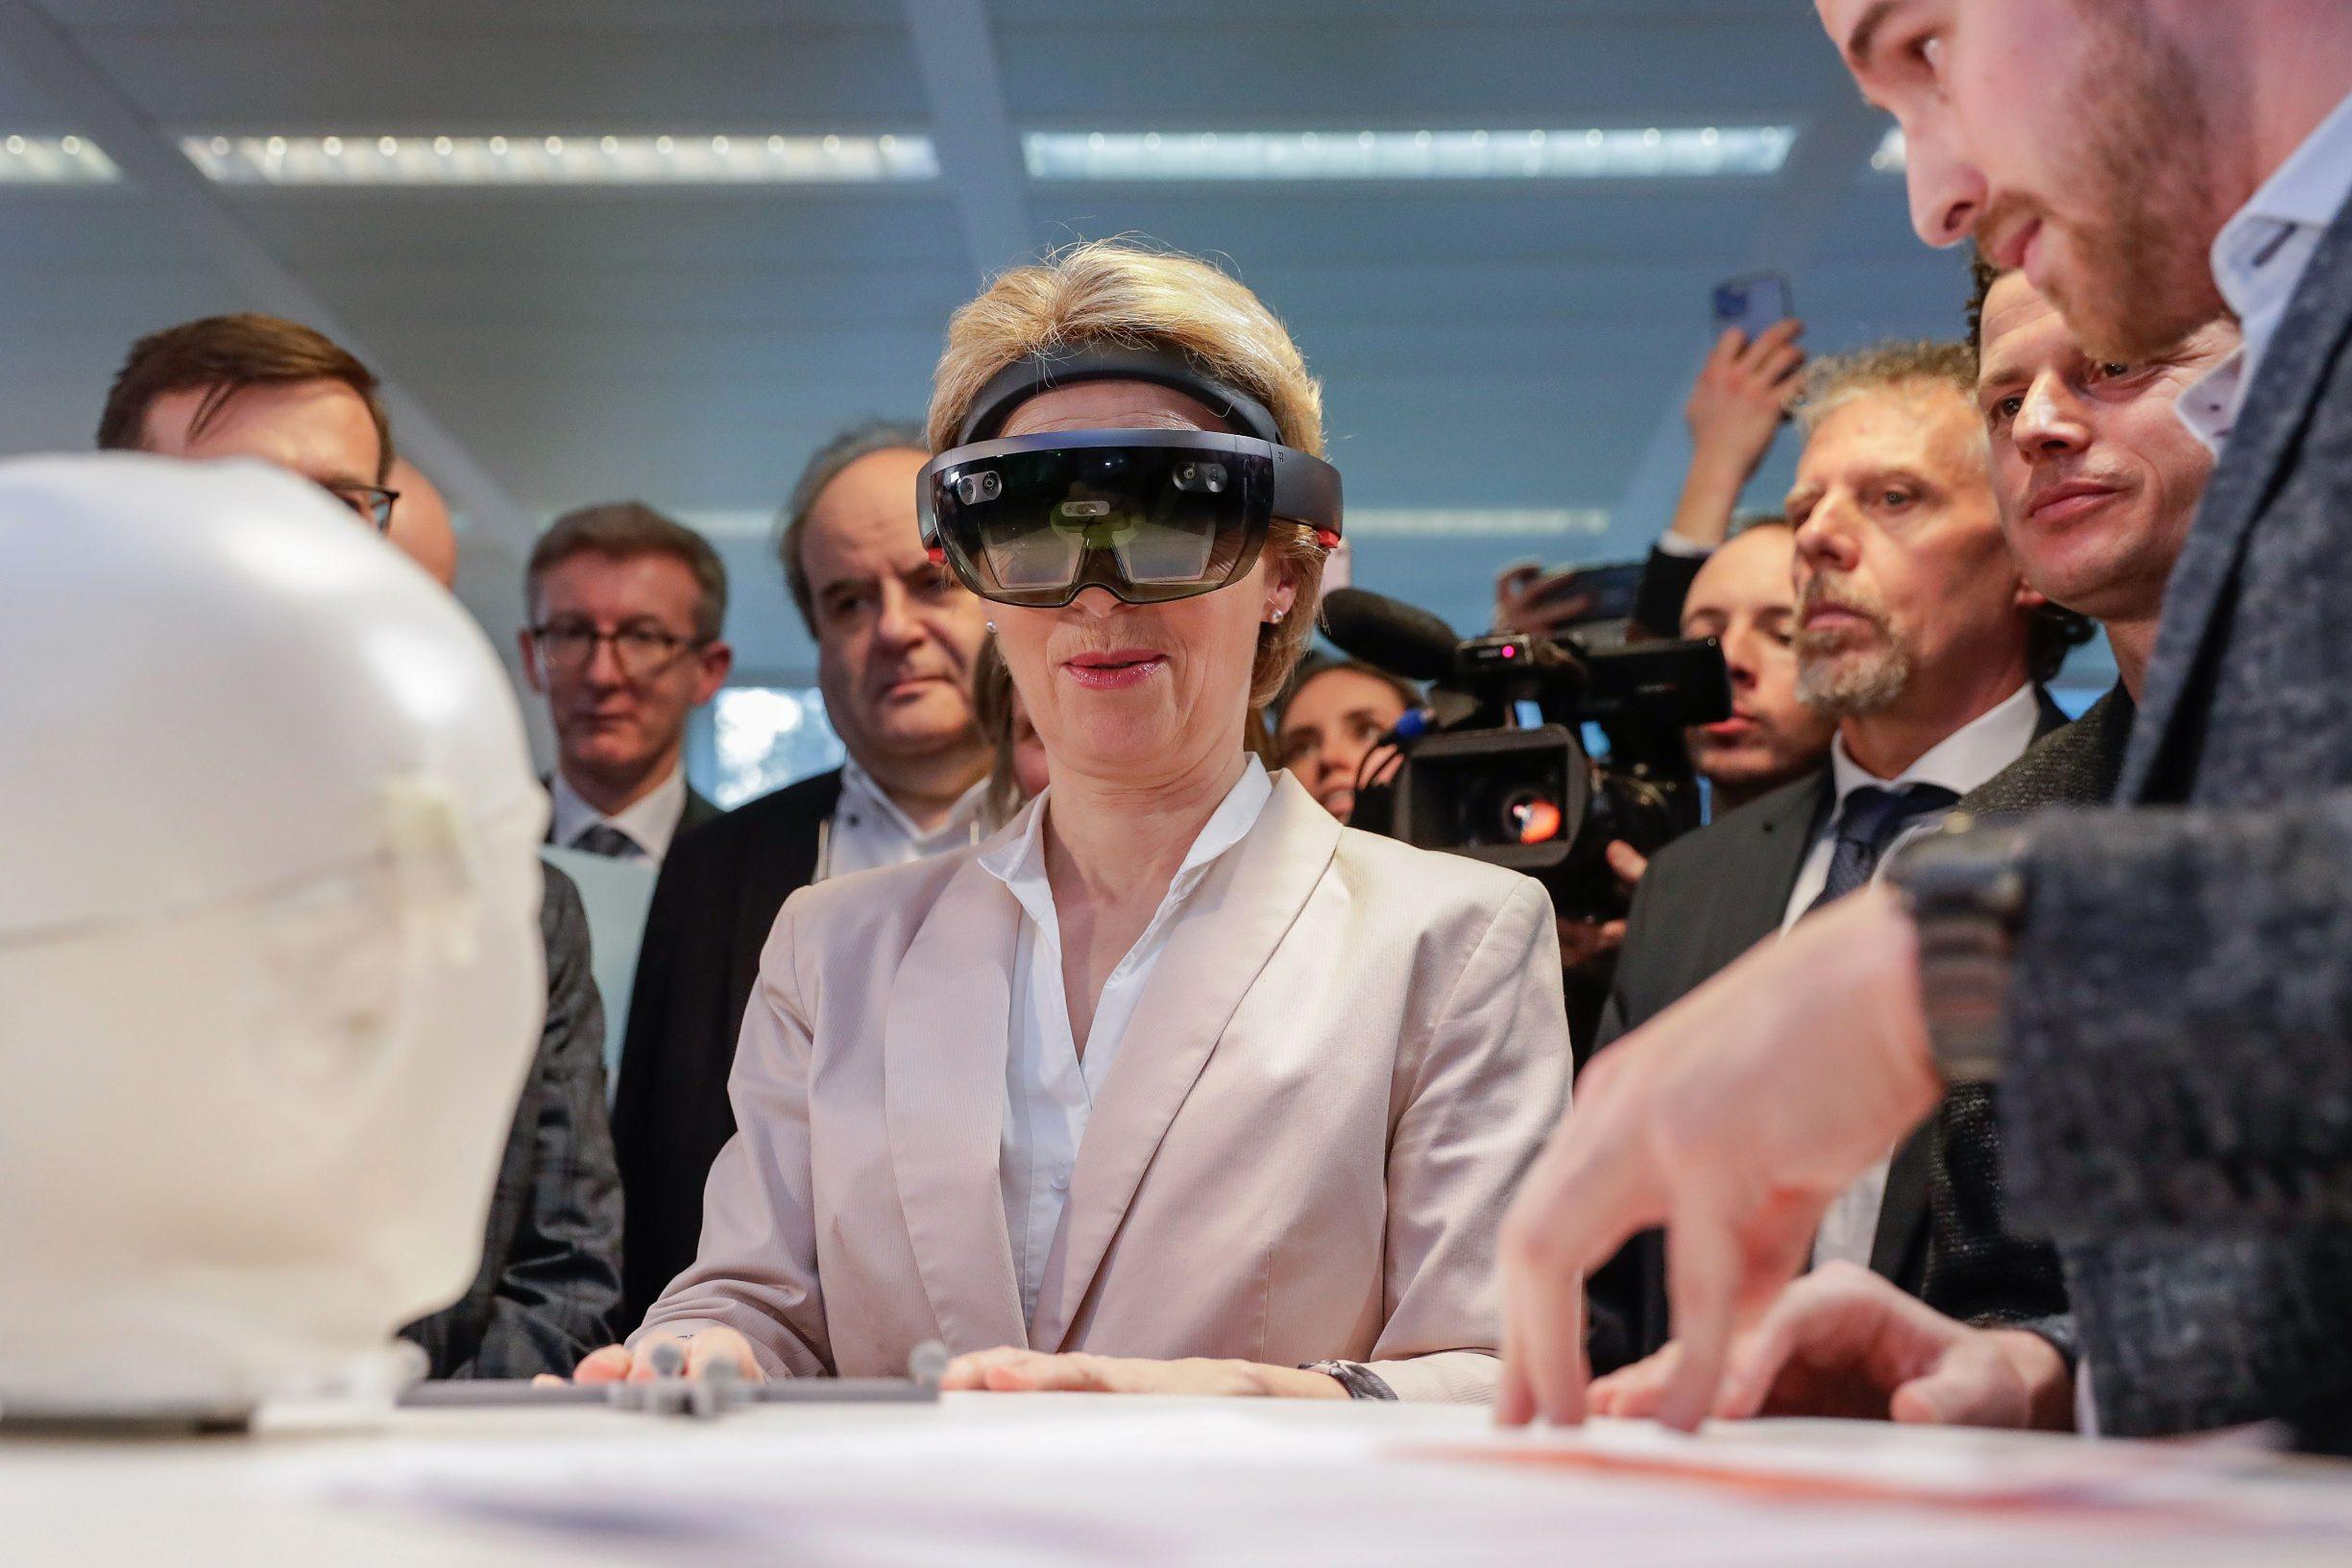 President of the European Commission Ursula von der Leyen (C) looks at the invention